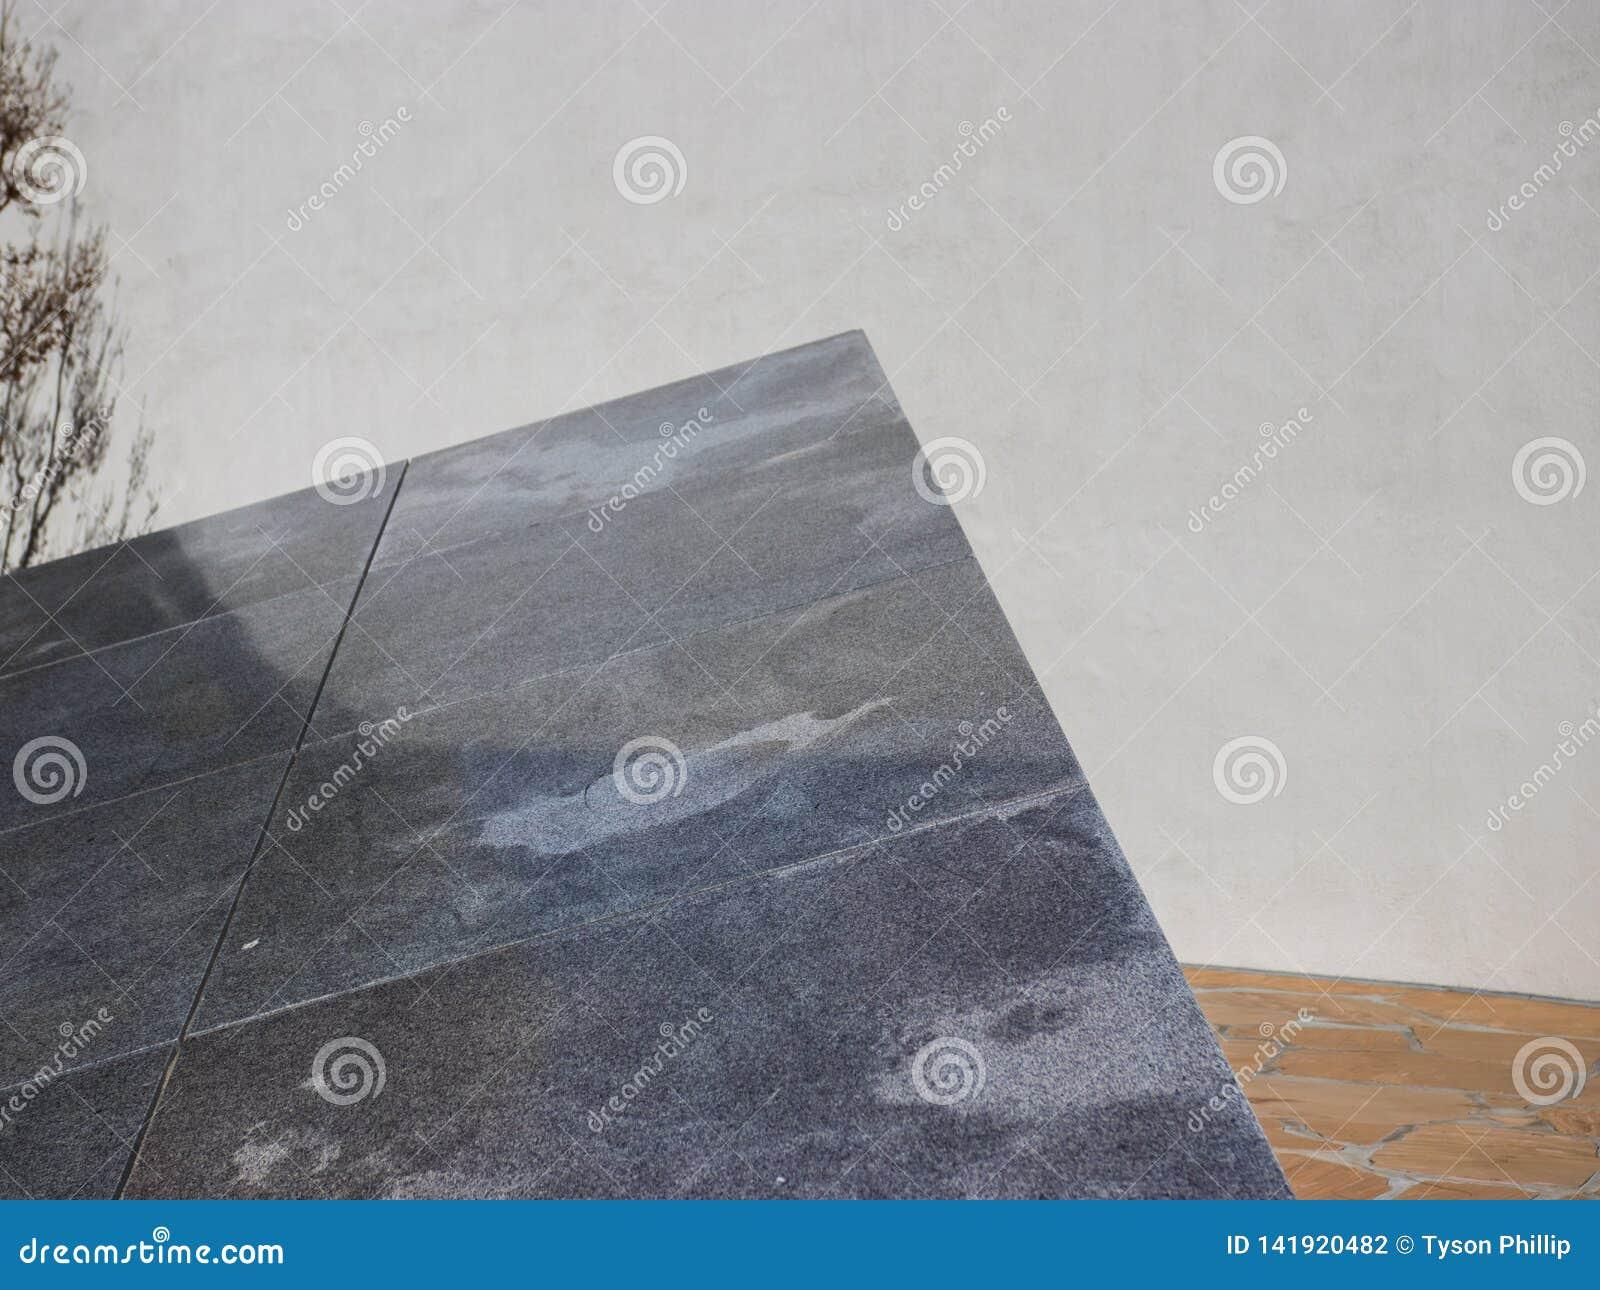 Verschiedene Steinbeschaffenheiten im Dreieck